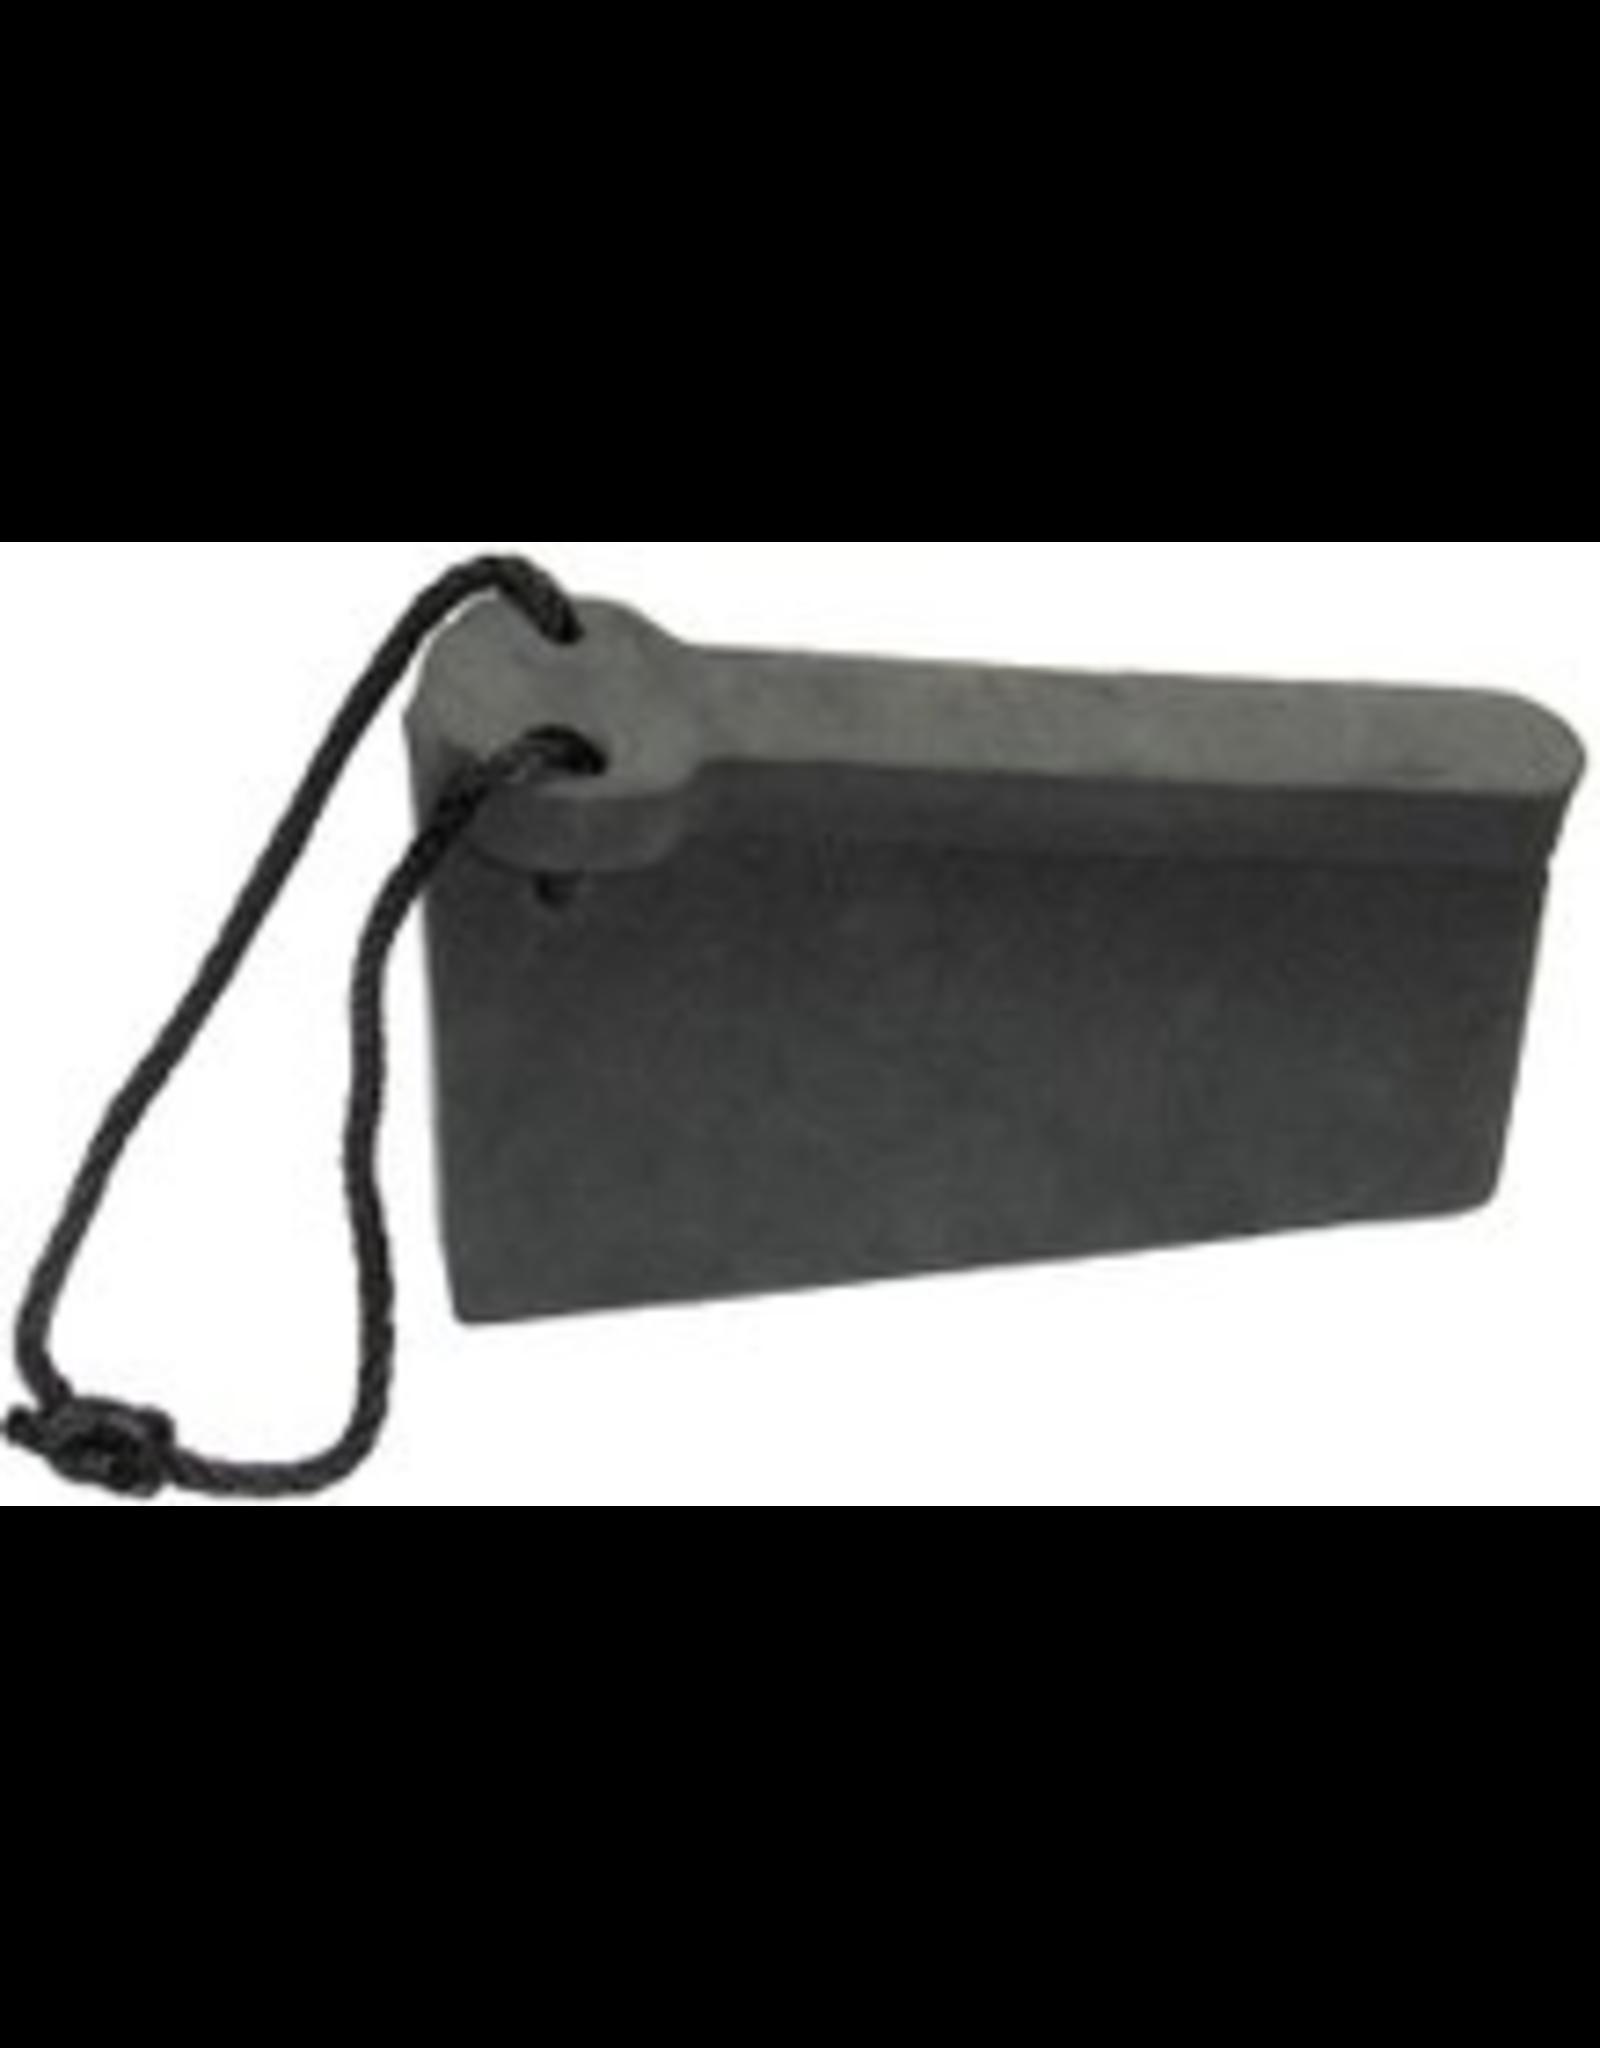 Hobie Hobie Daggerboard Well Plug for Adventure and Revolution 16 Kayaks